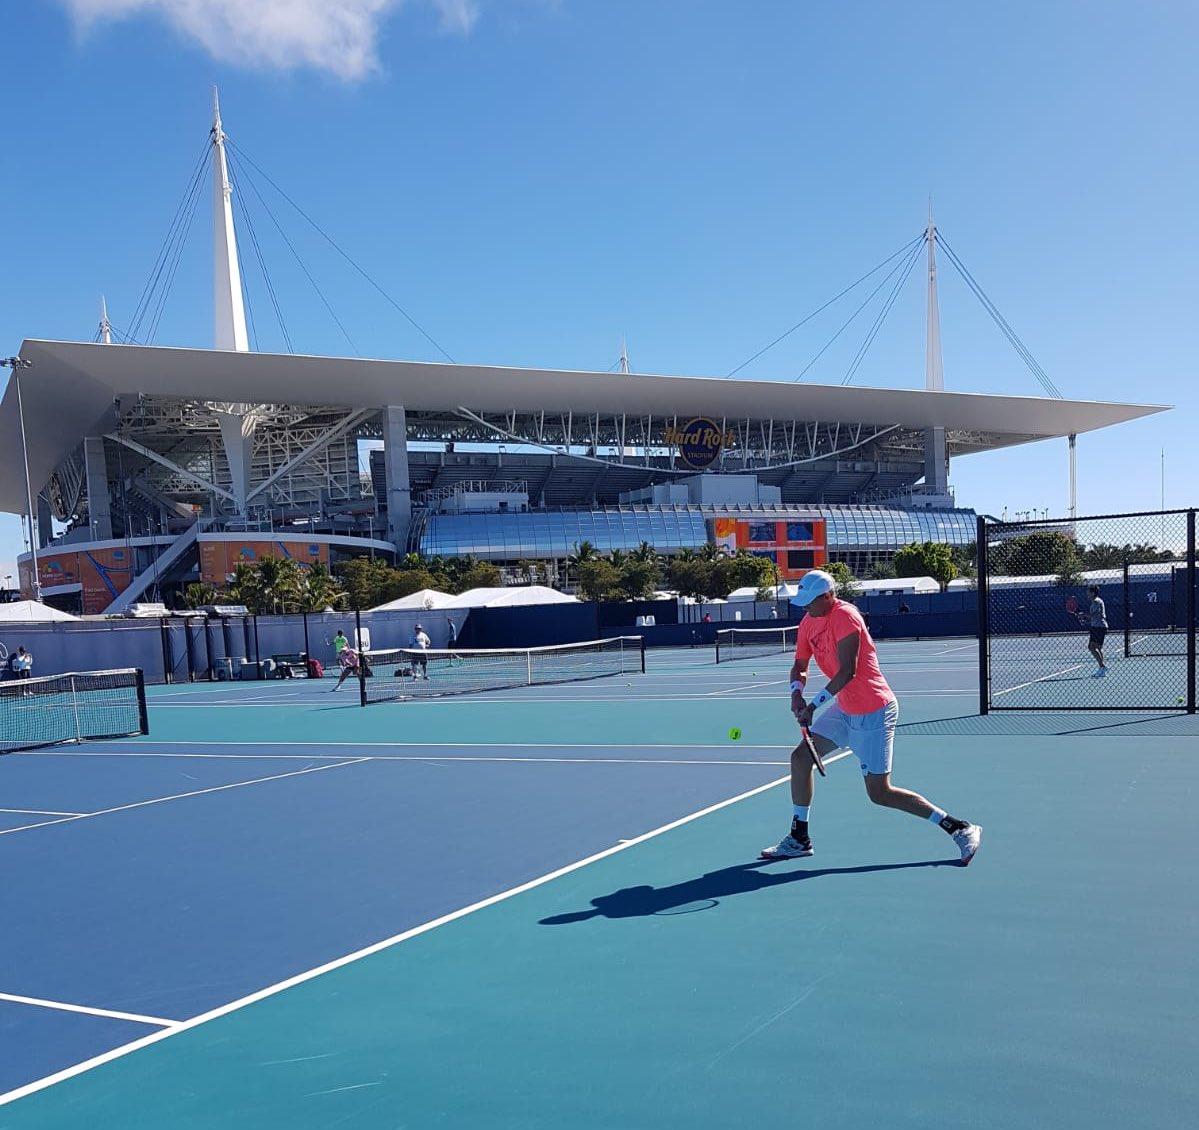 #ATPTour #Tennis RT KAndersonATP: Great first practice at the new MiamiOpen venue <br>http://pic.twitter.com/sHnRDqw6ei